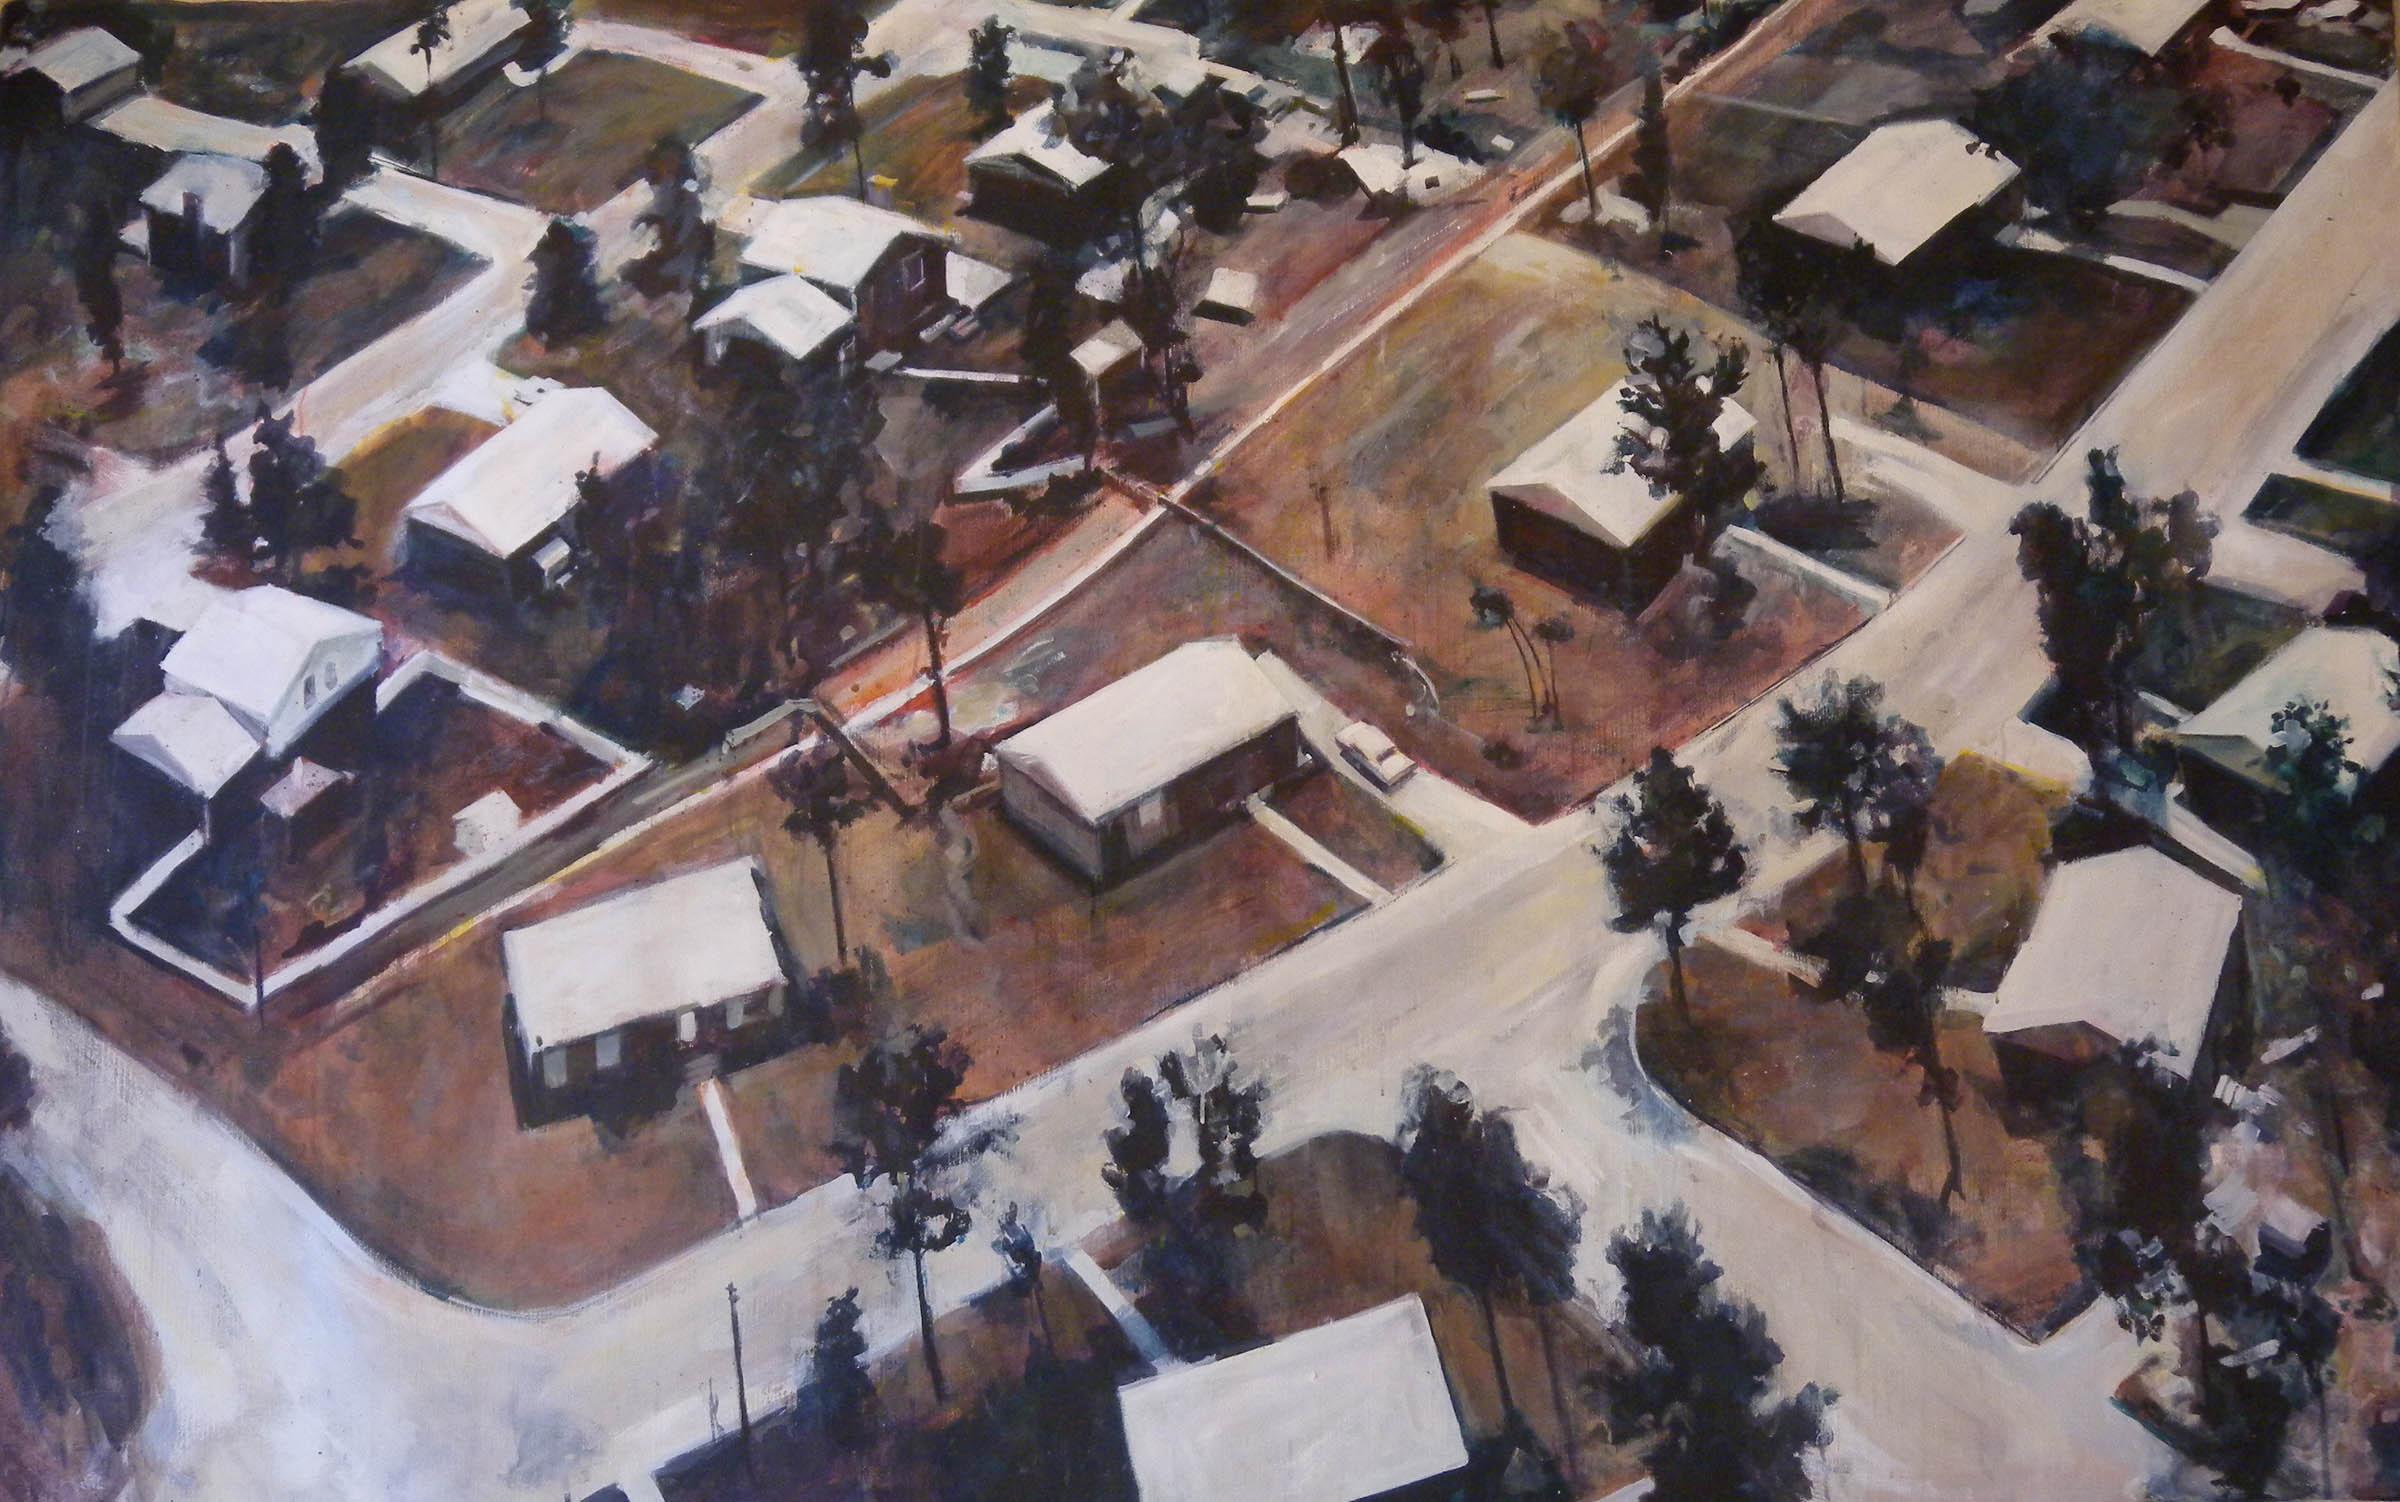 "Suburban Sprawl, acrylic on canvas, 5' x 8'3"", 1972"